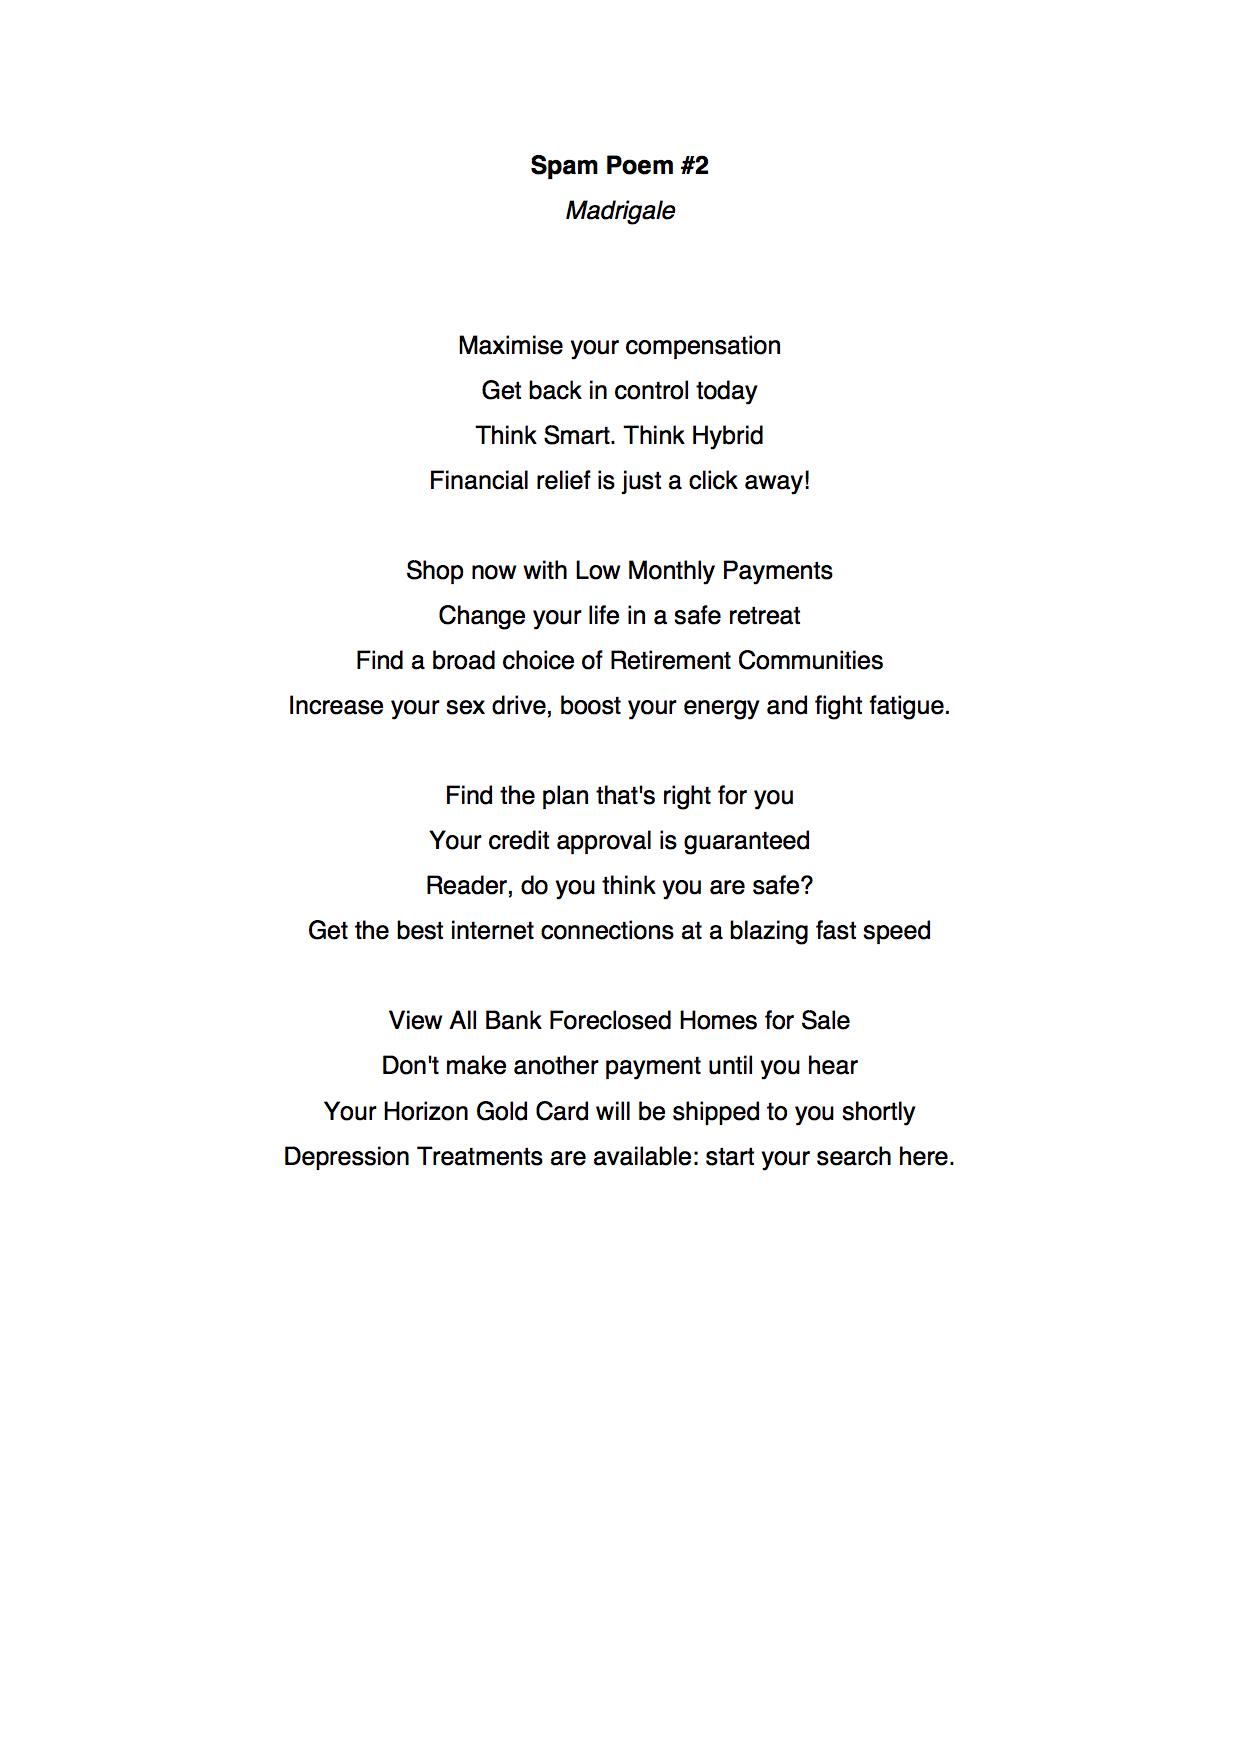 Spam Poem MADRIGALE